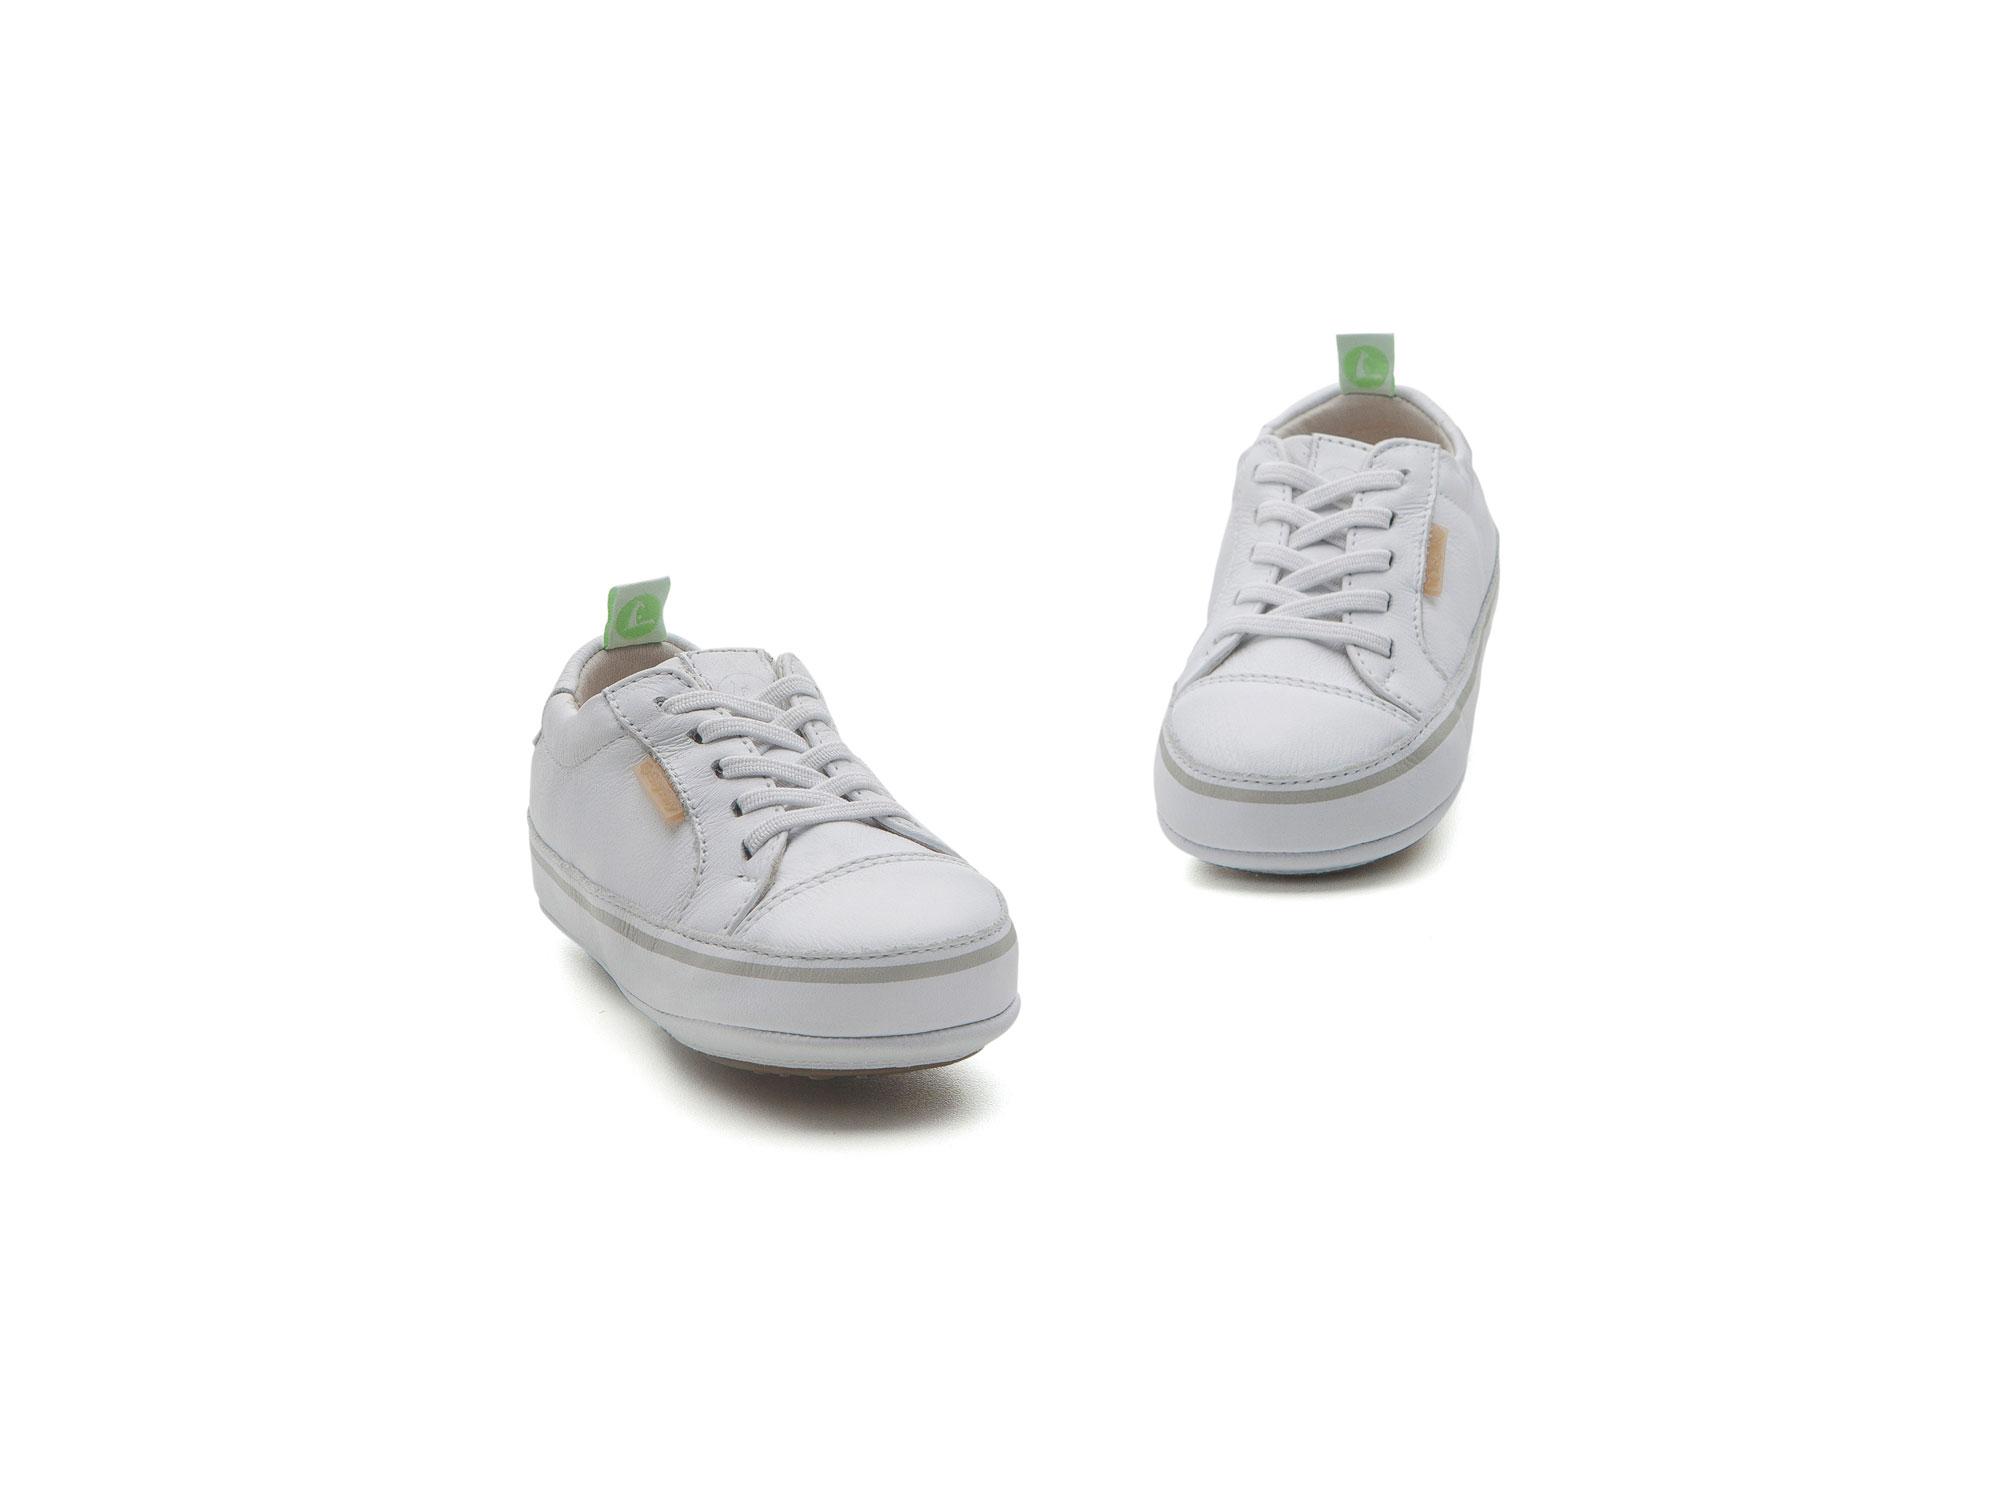 Tênis Funky White/ White  Baby 0 à 2 anos - 2